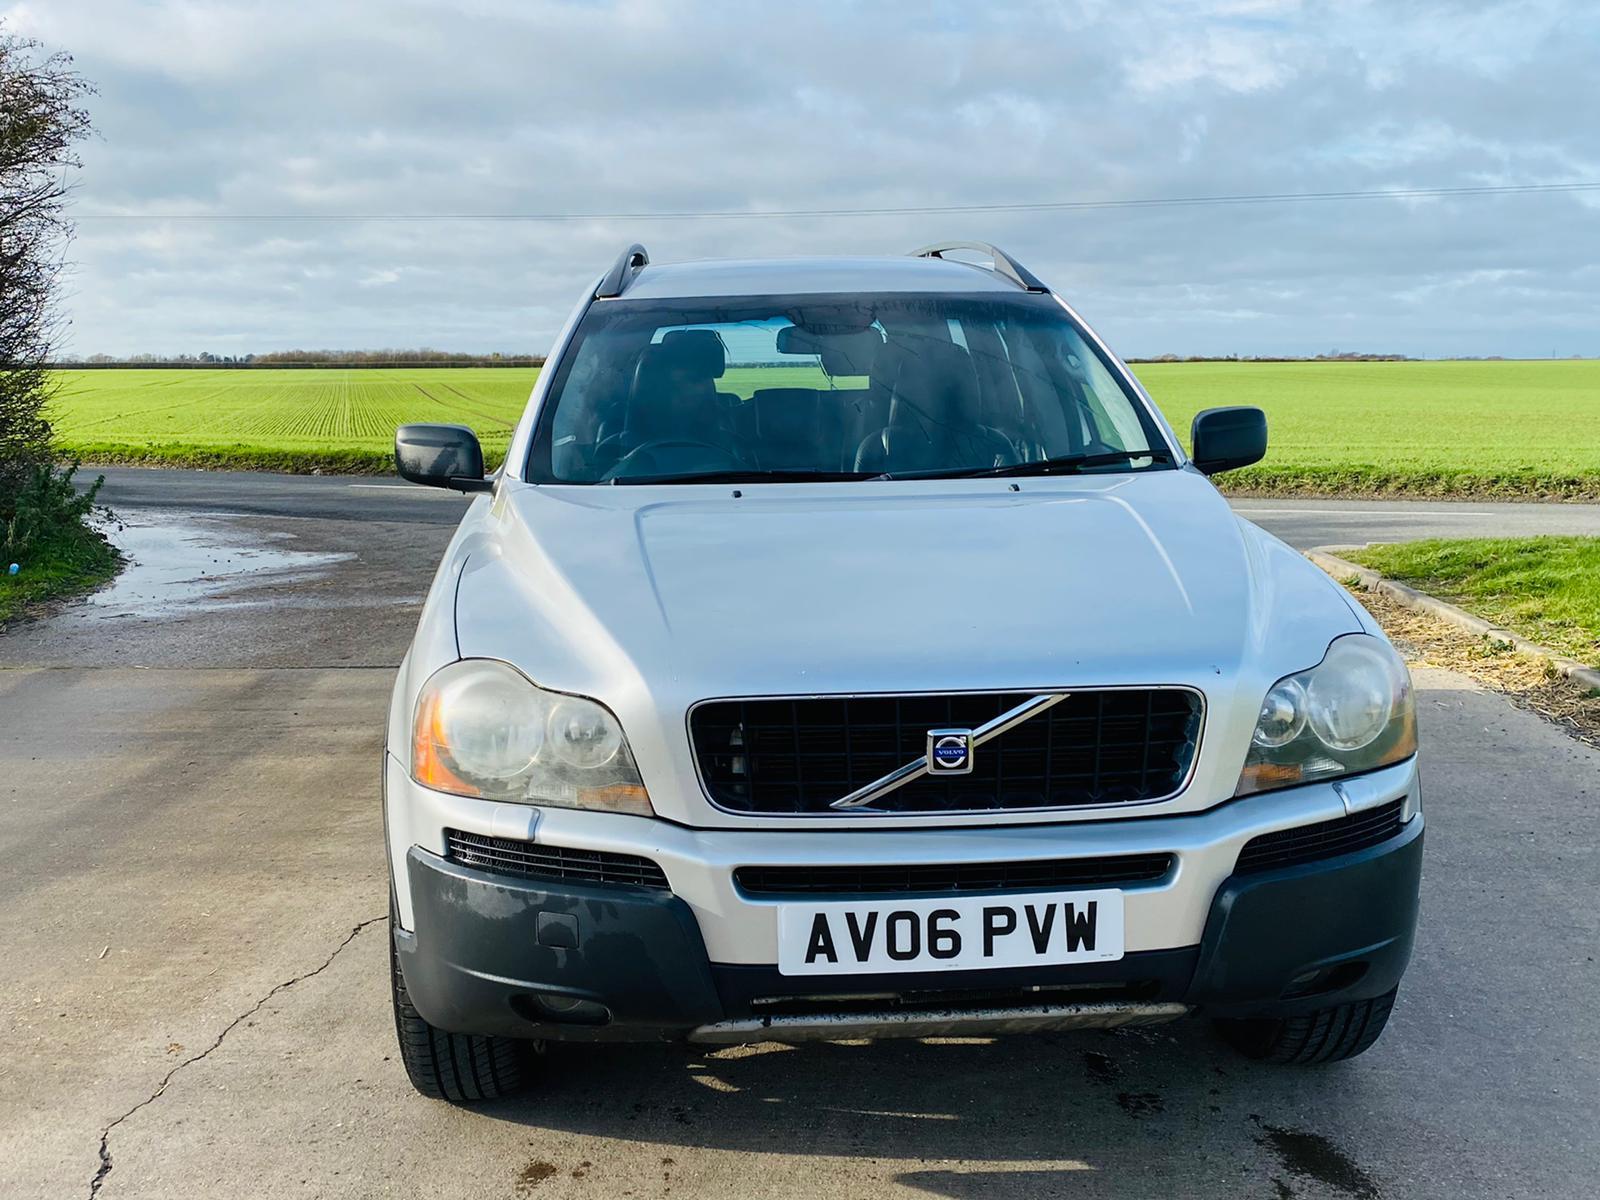 Volvo XC90 2.4 D5 185bhp SE Geartronic Auto 2006 06 Reg - 7 Seats - Air con - Top Spec - Image 12 of 47